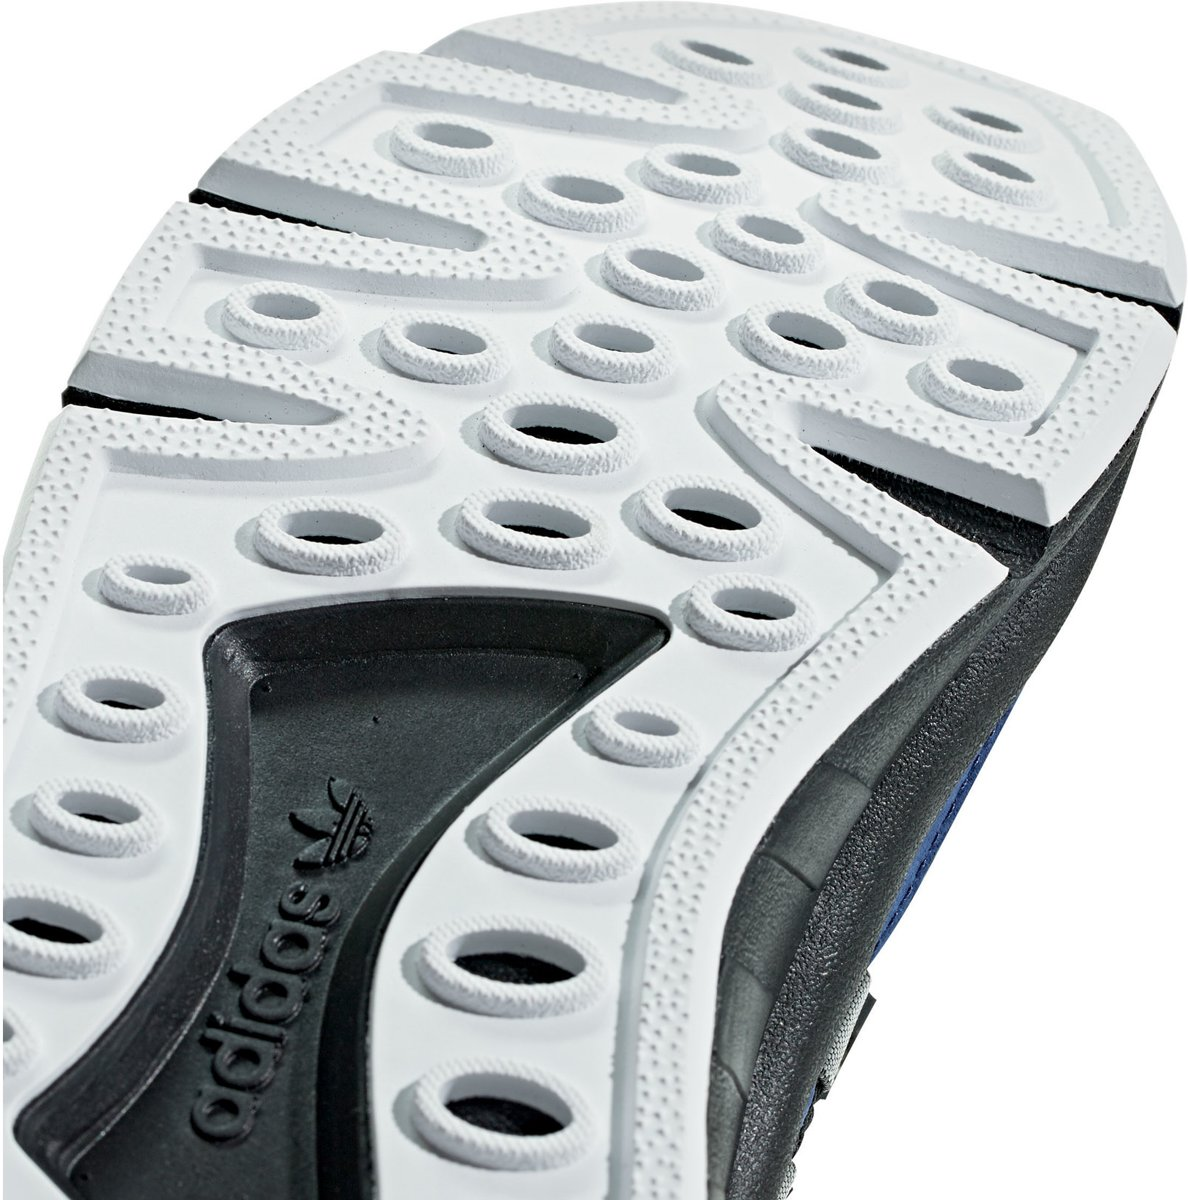 the latest 0e488 06579 bol.com  adidas Eqt Support Mid Adv Pk Sneakers Heren - Dark Blue - Maat  45 13